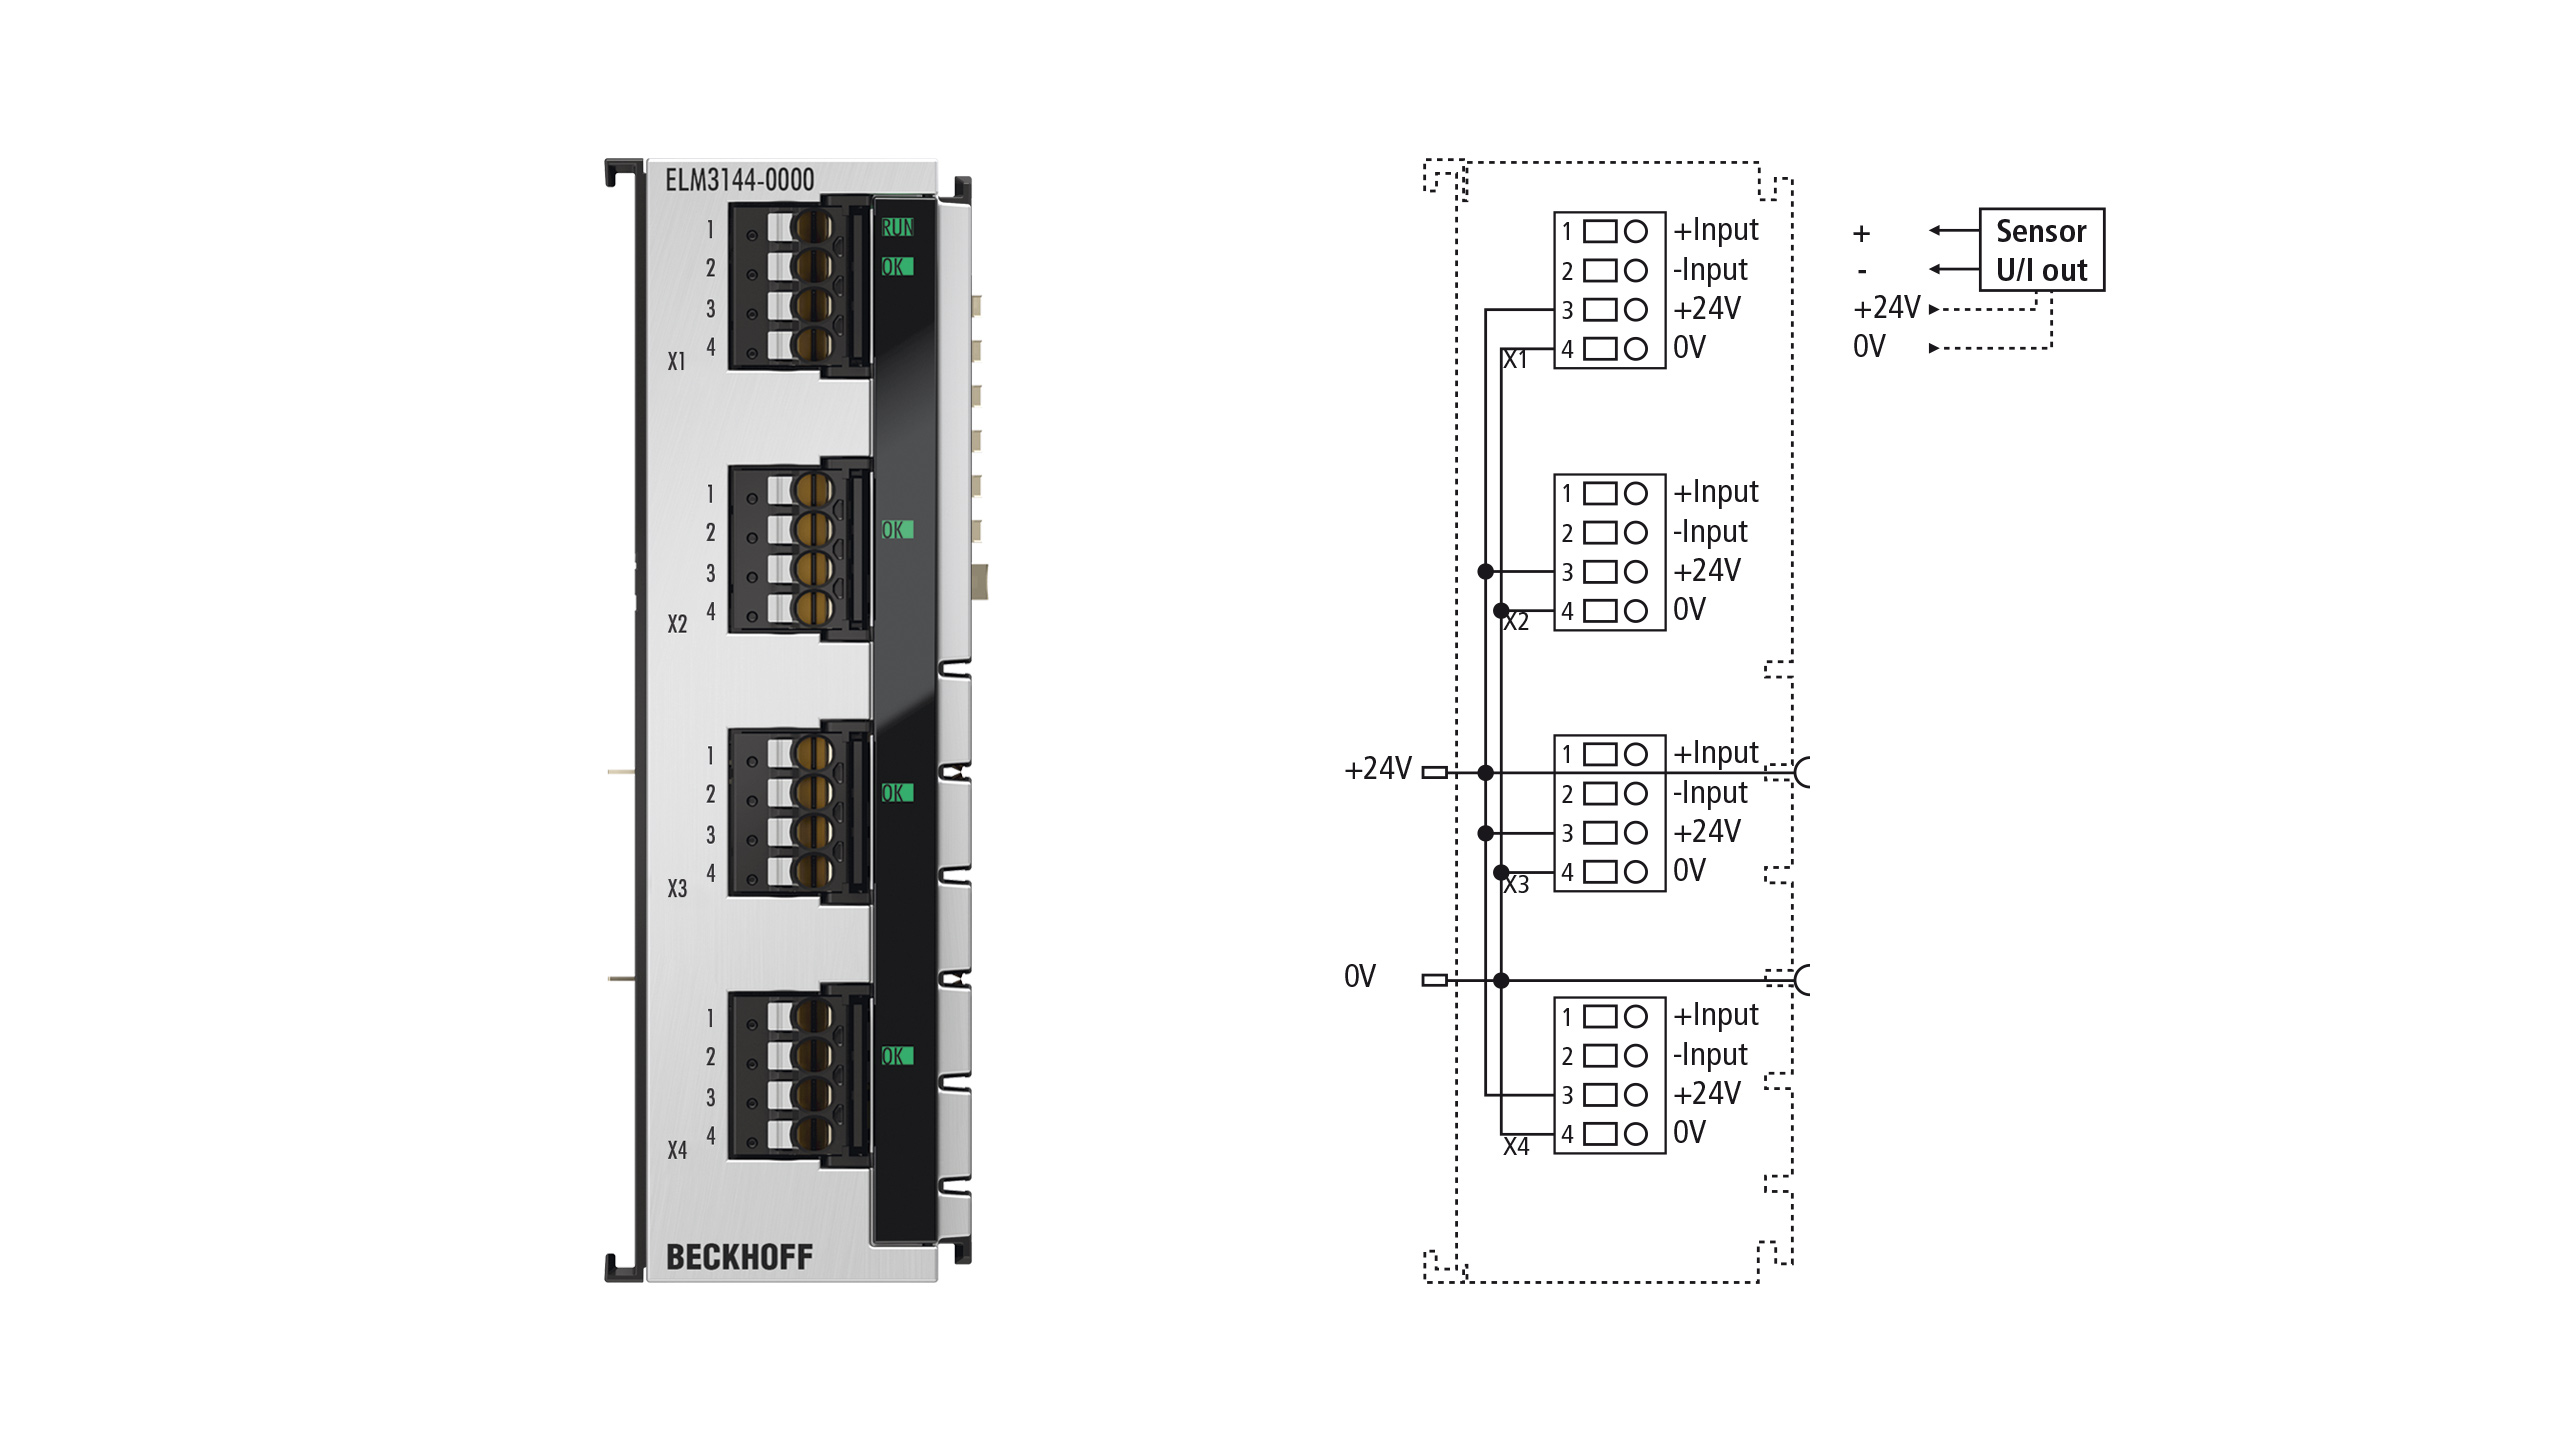 ELM3144-0000 | 4-Kanal-Analog-Eingang ±10…±1,25V, ±20mA, 24Bit, 1kSps